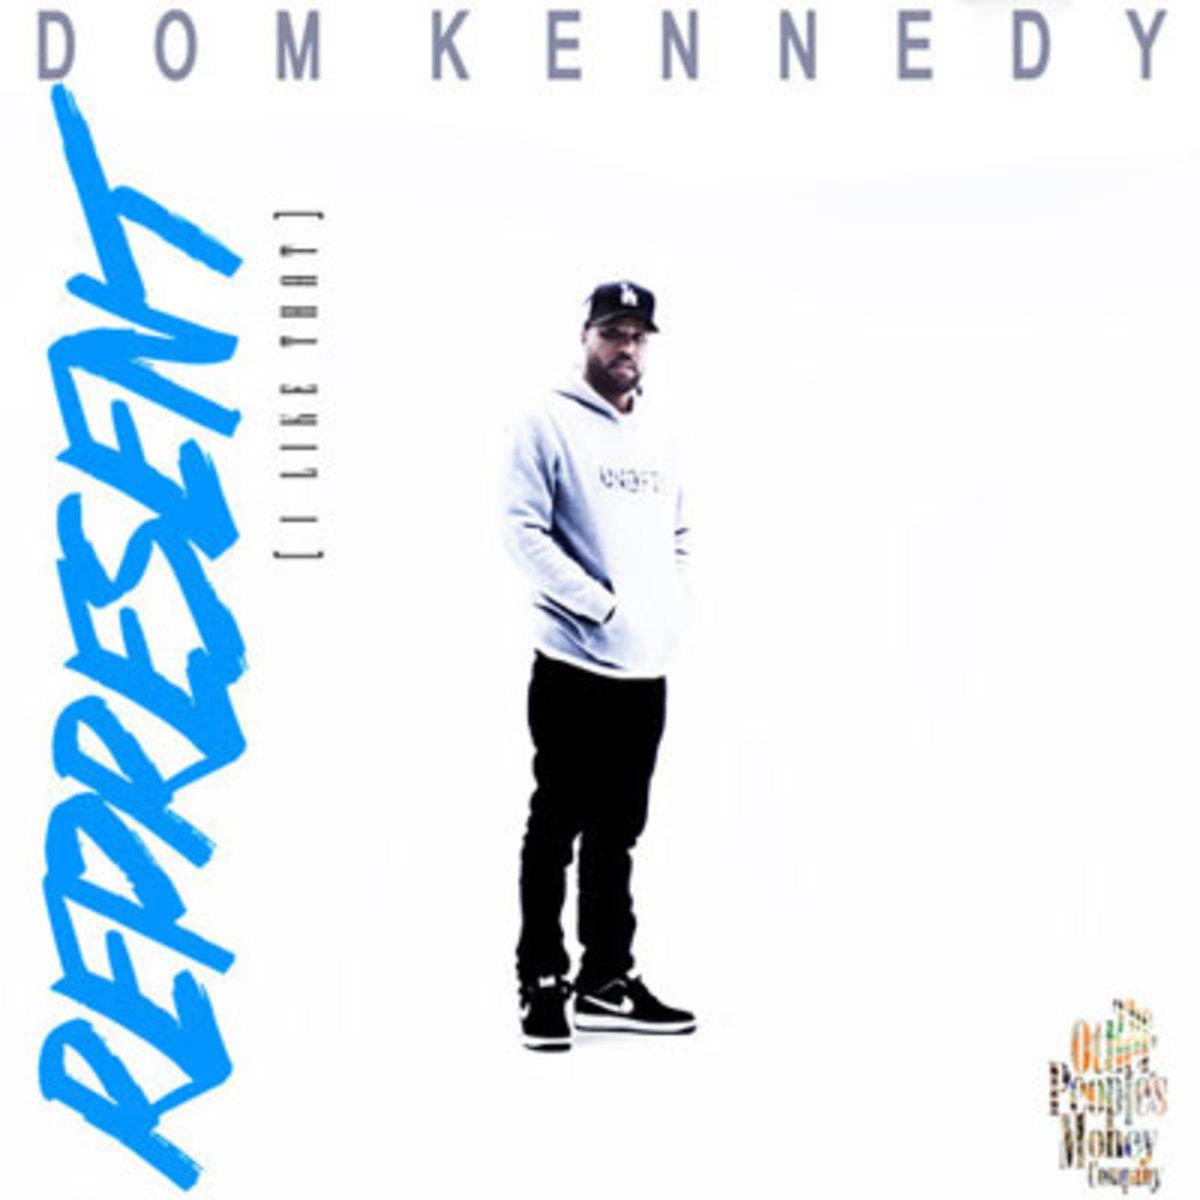 domkennedy-represent.jpg